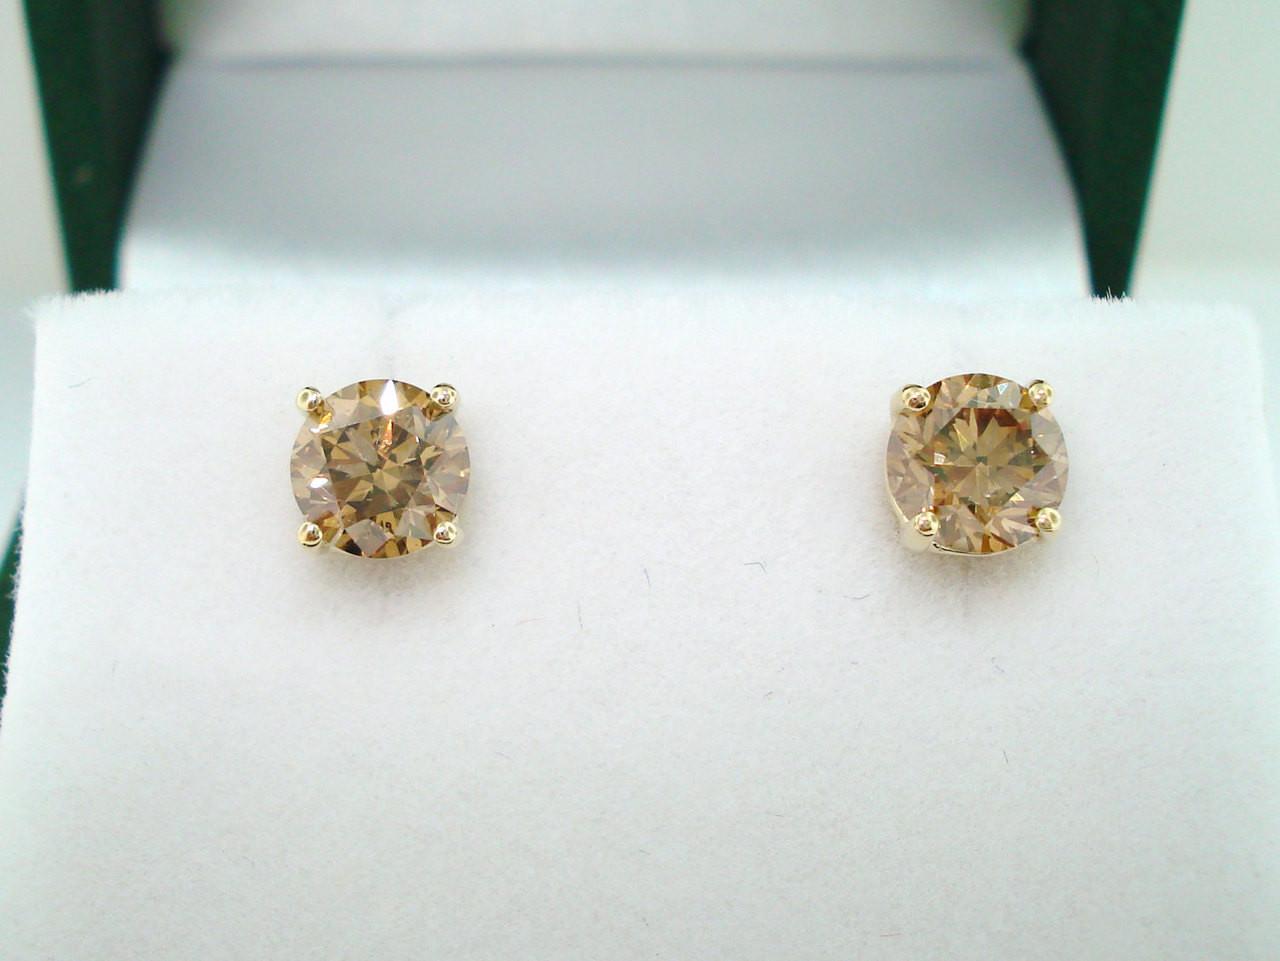 carat fancy champagne brown diamond stud earrings 14k. Black Bedroom Furniture Sets. Home Design Ideas